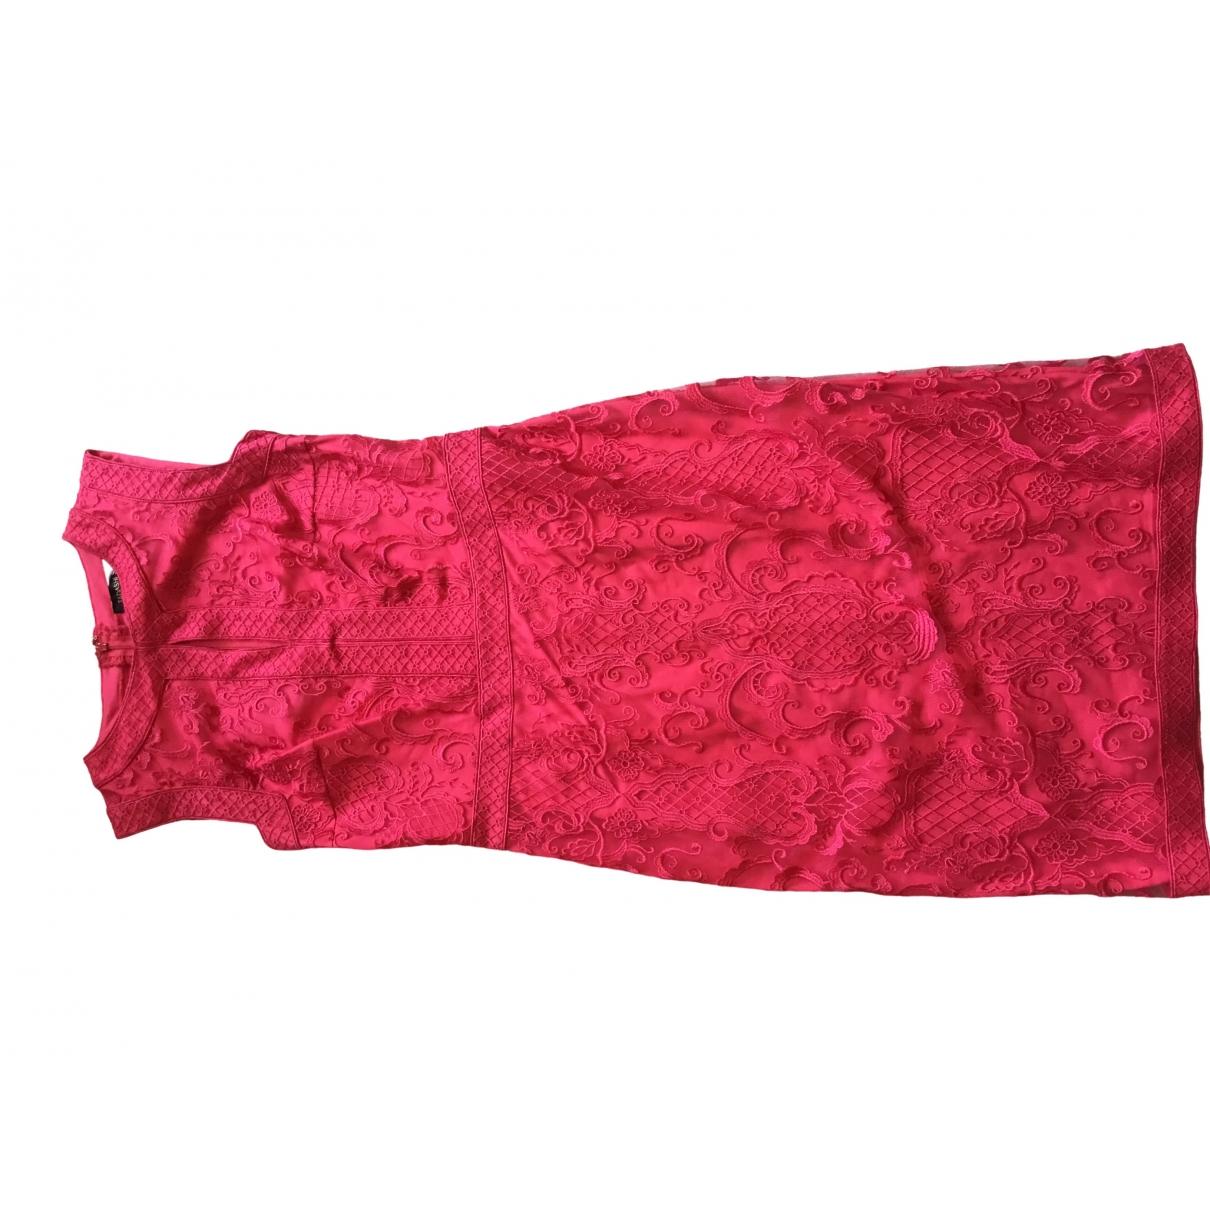 Tadashi Shoji \N Kleid in  Rosa Polyester